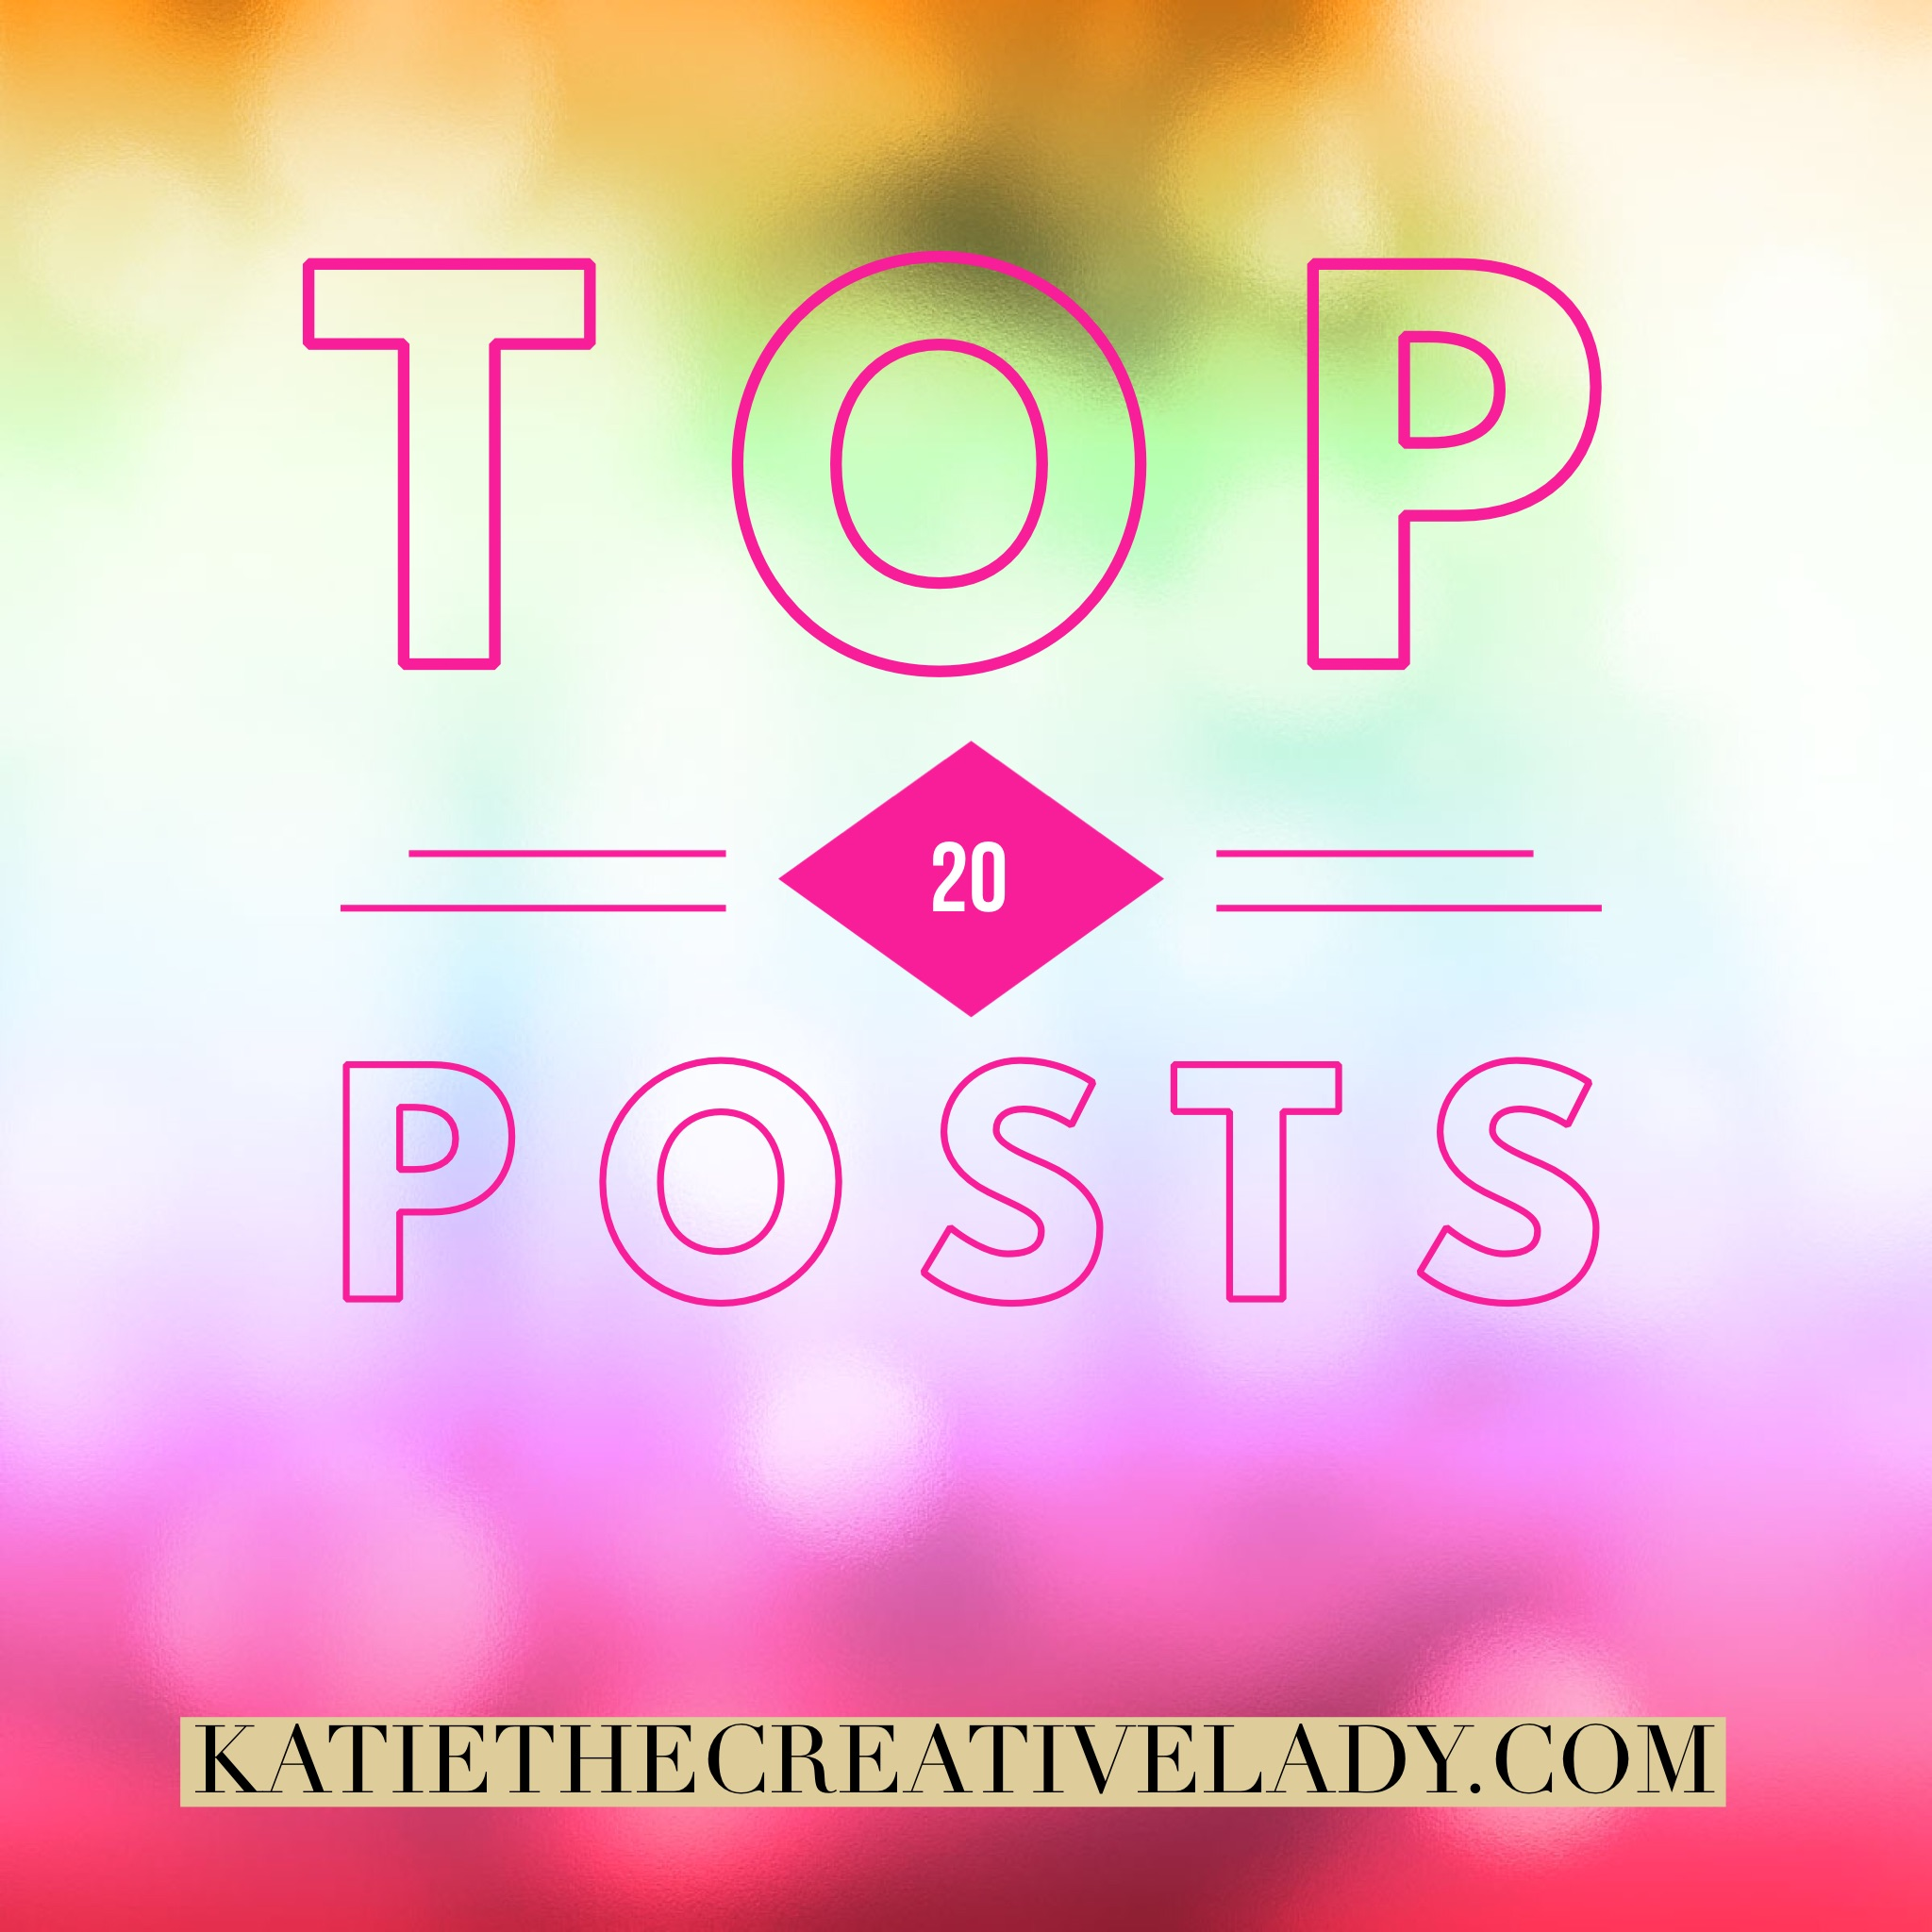 Top 20 Katie the Creative Lady.jpg